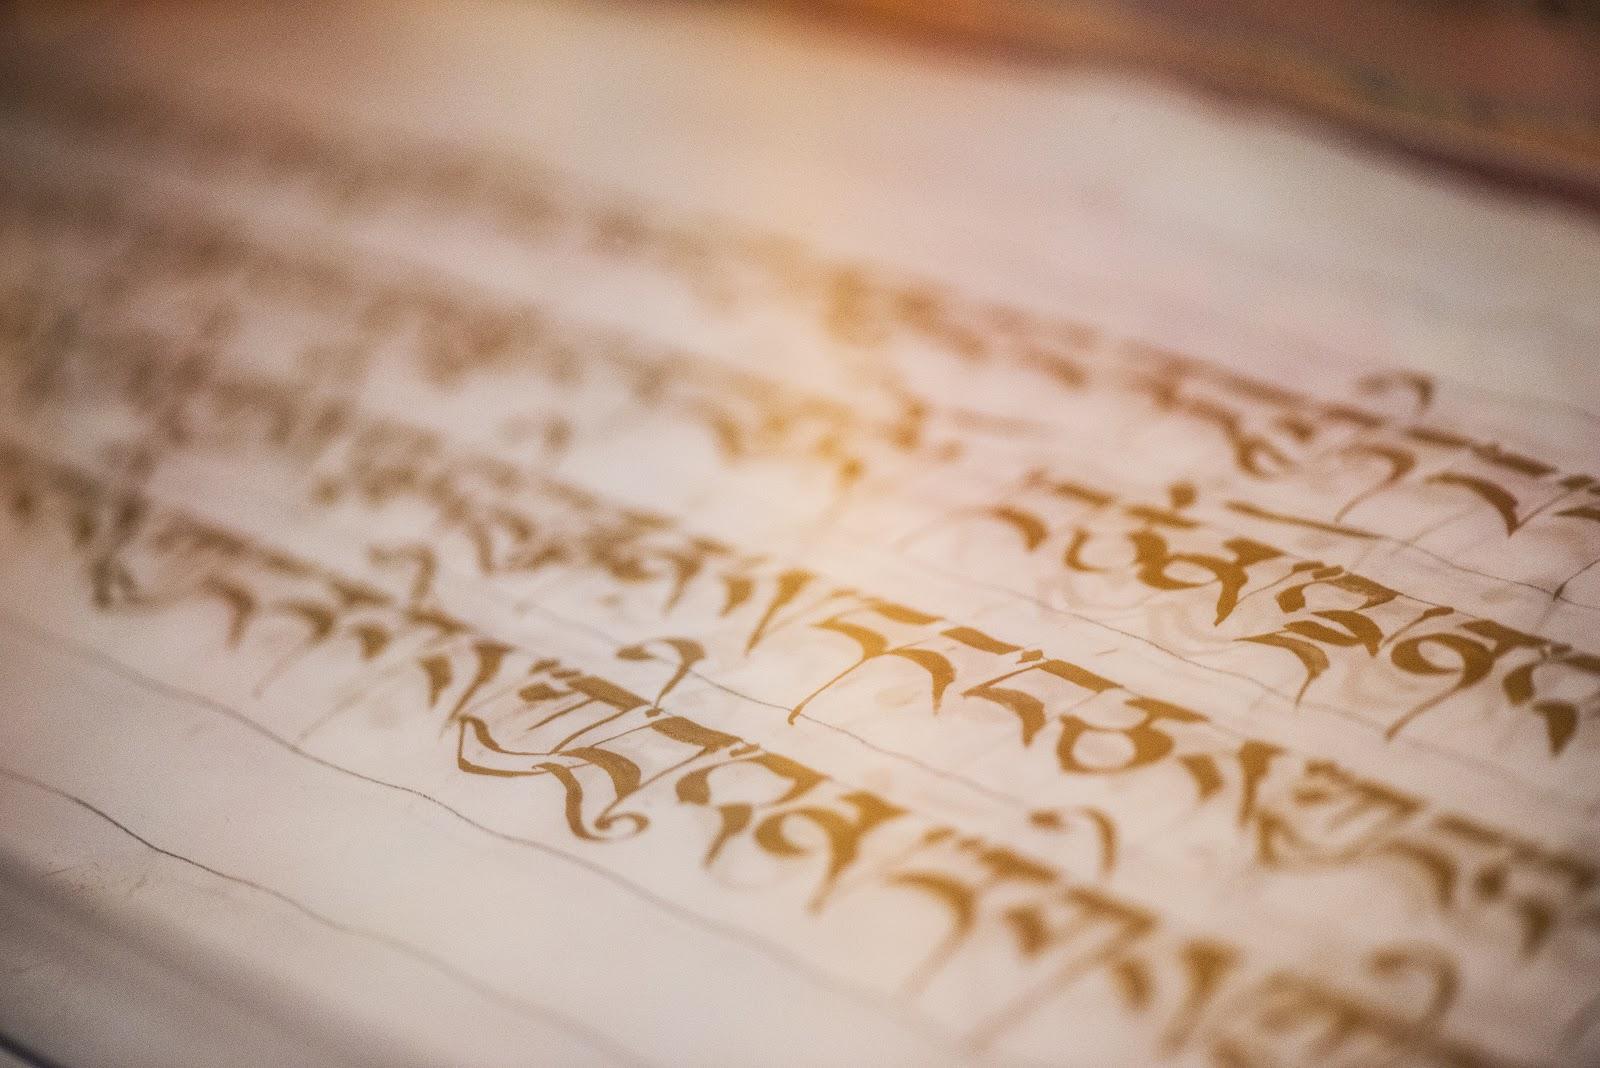 Prajnaparamita in pure gold at Kachoe Dechen Ling. Photo by Chris Majors.